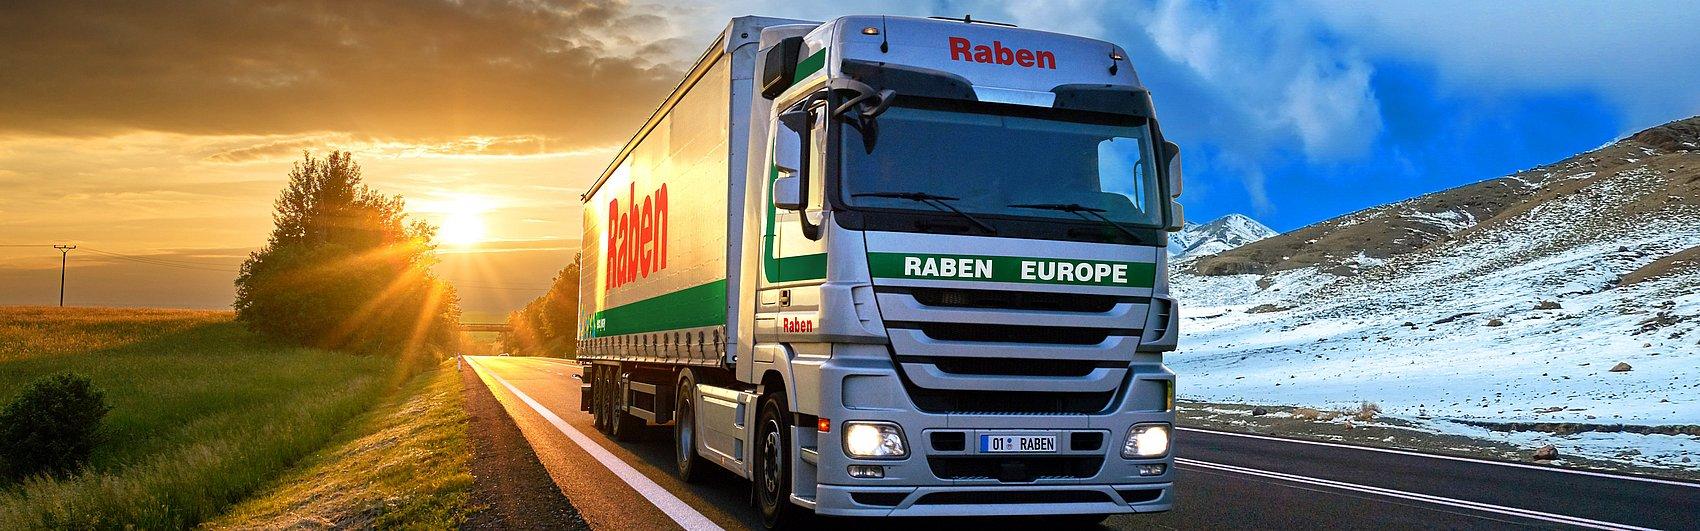 csm_KV_2019_Raben_Group_Europe_b0ad9af500.jpg